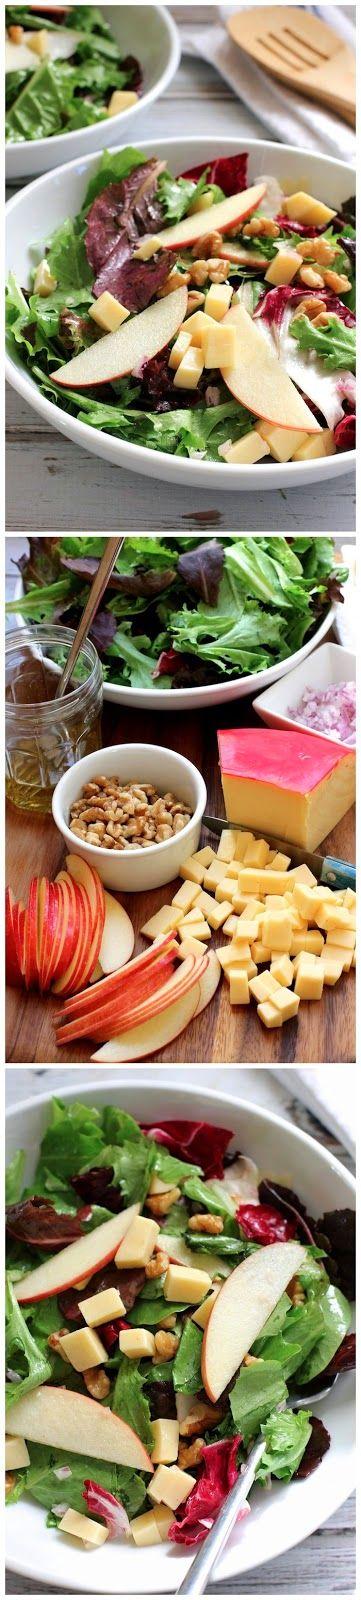 Apple Gouda Walnut Salad